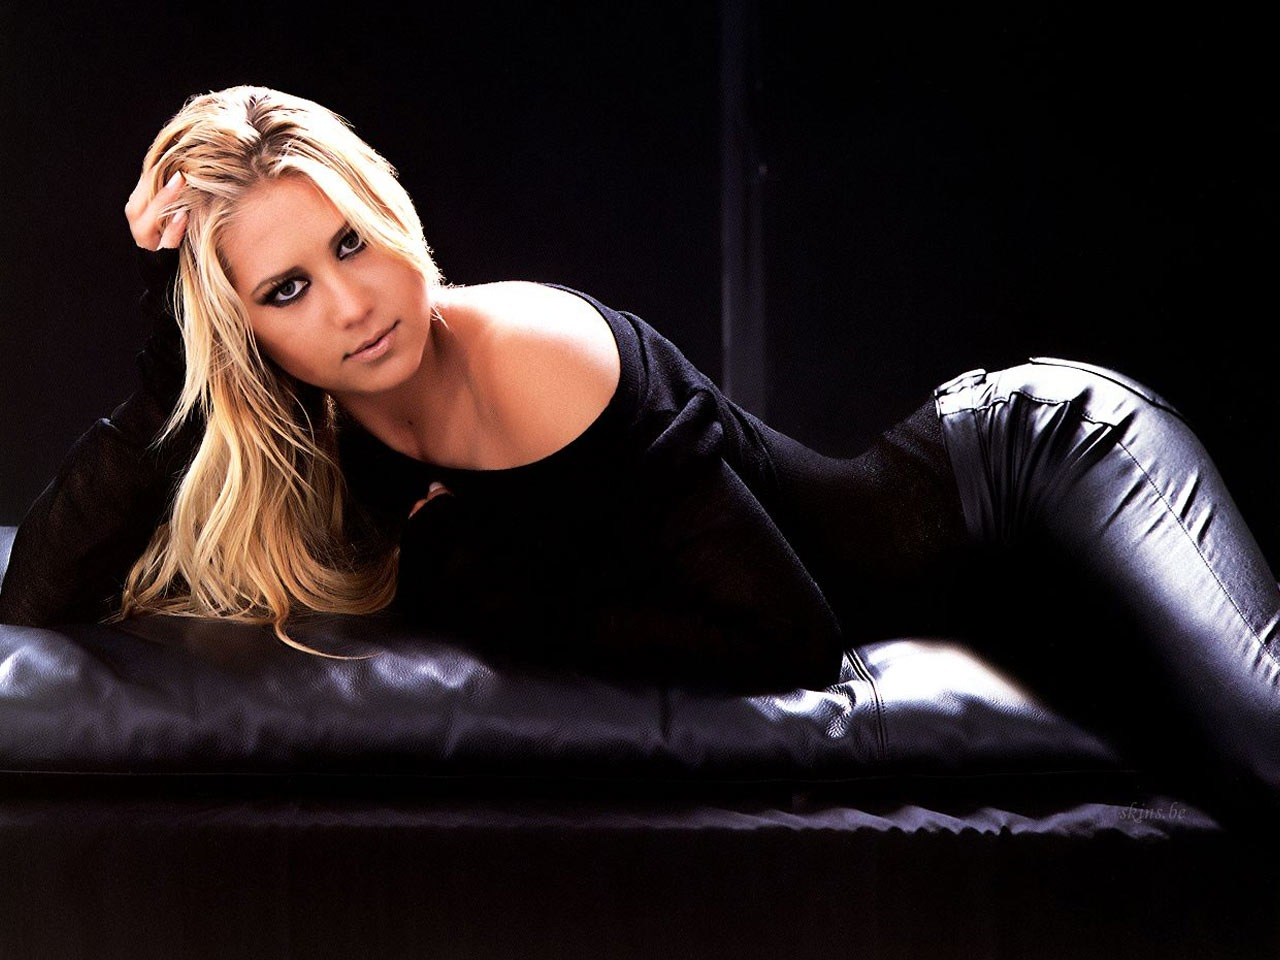 hollywood stars anna kournikova hot wallpapers 2012